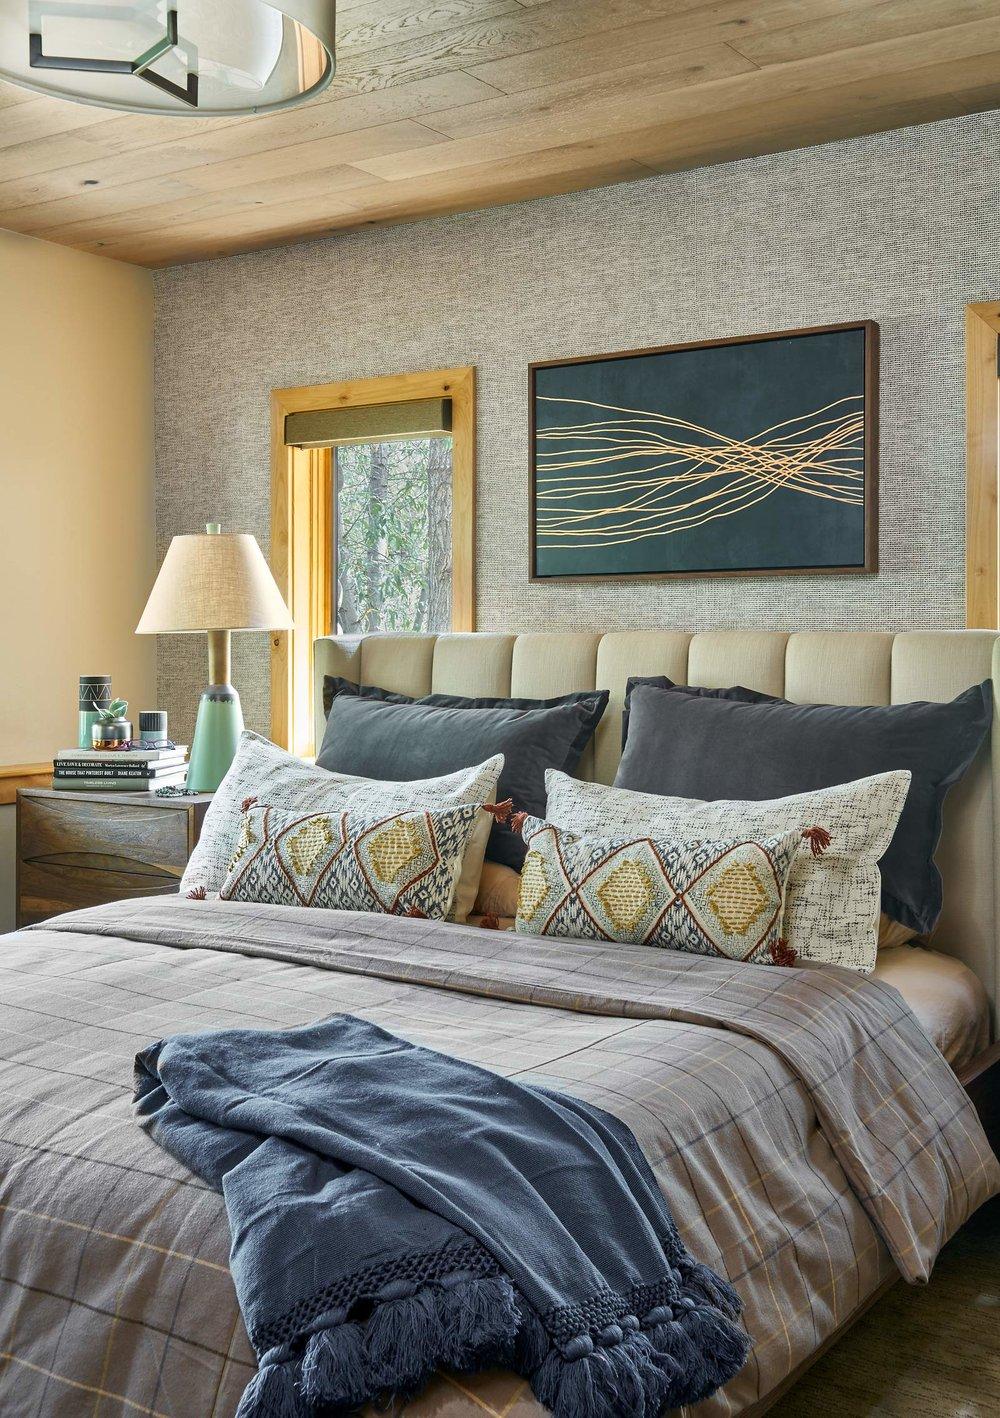 Rumor-Jerrys-08-14-18-Master-Bedroom-Web.jpg